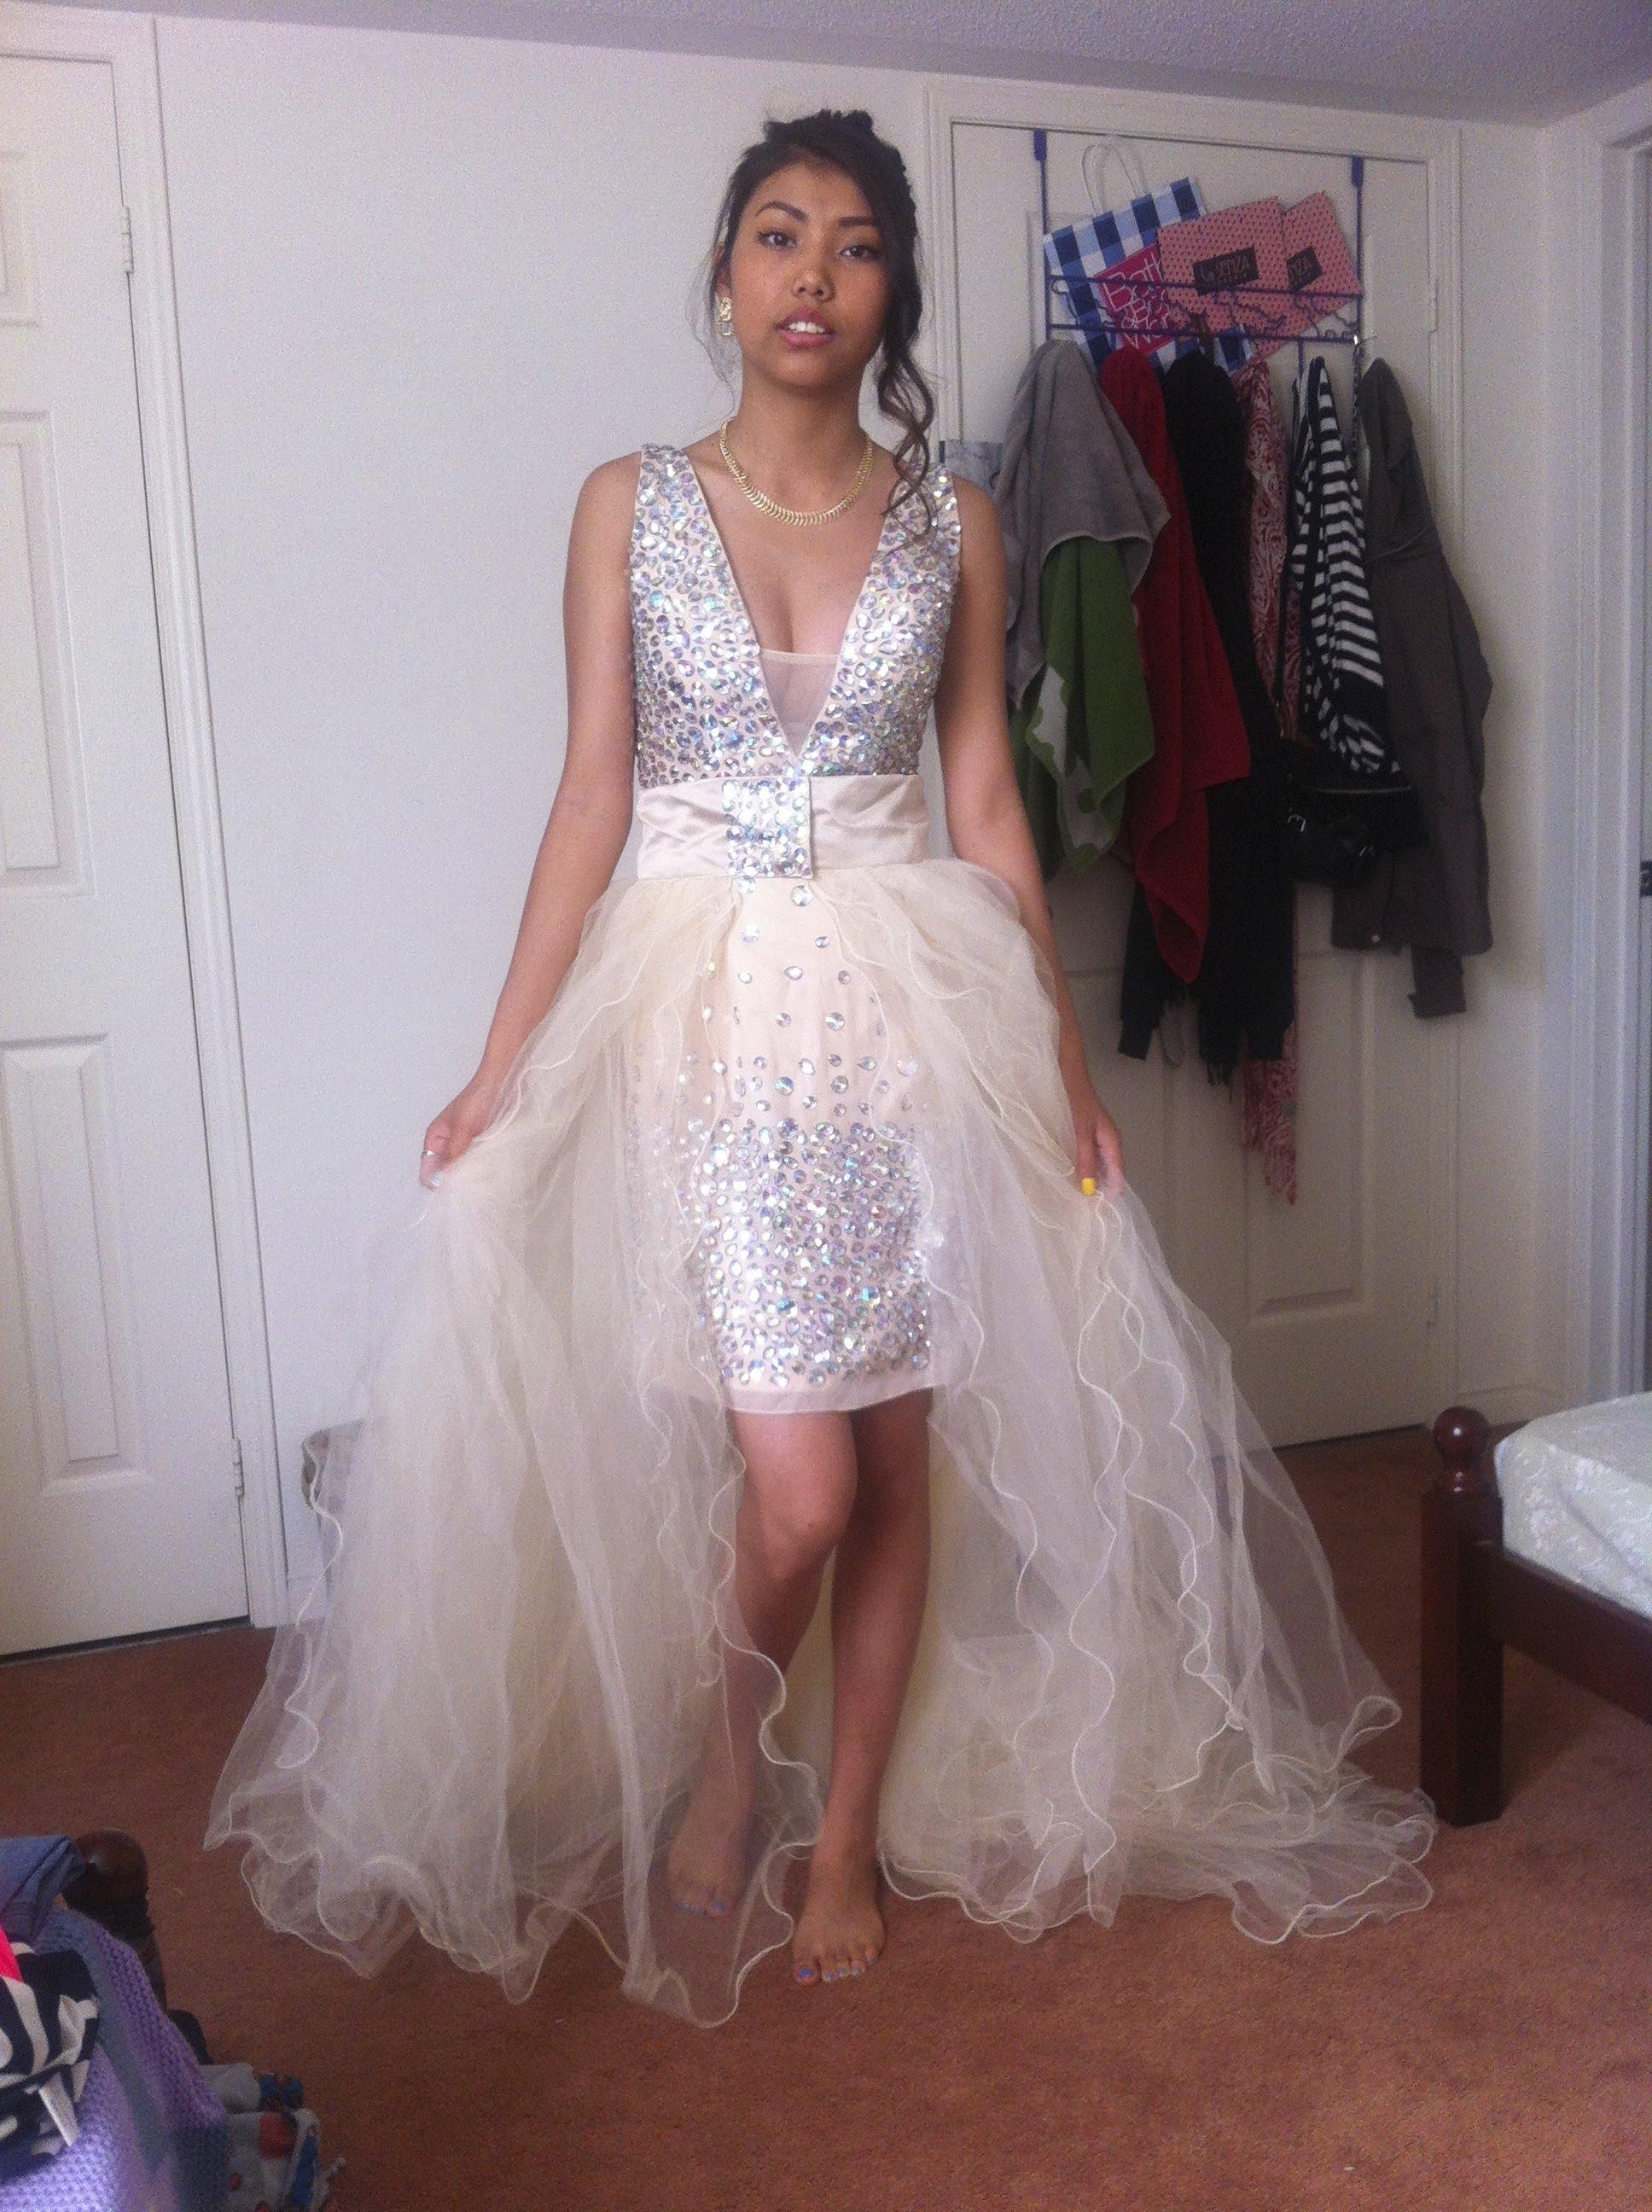 Jjs house wedding dresses reviews   SandiegoTowingca.com